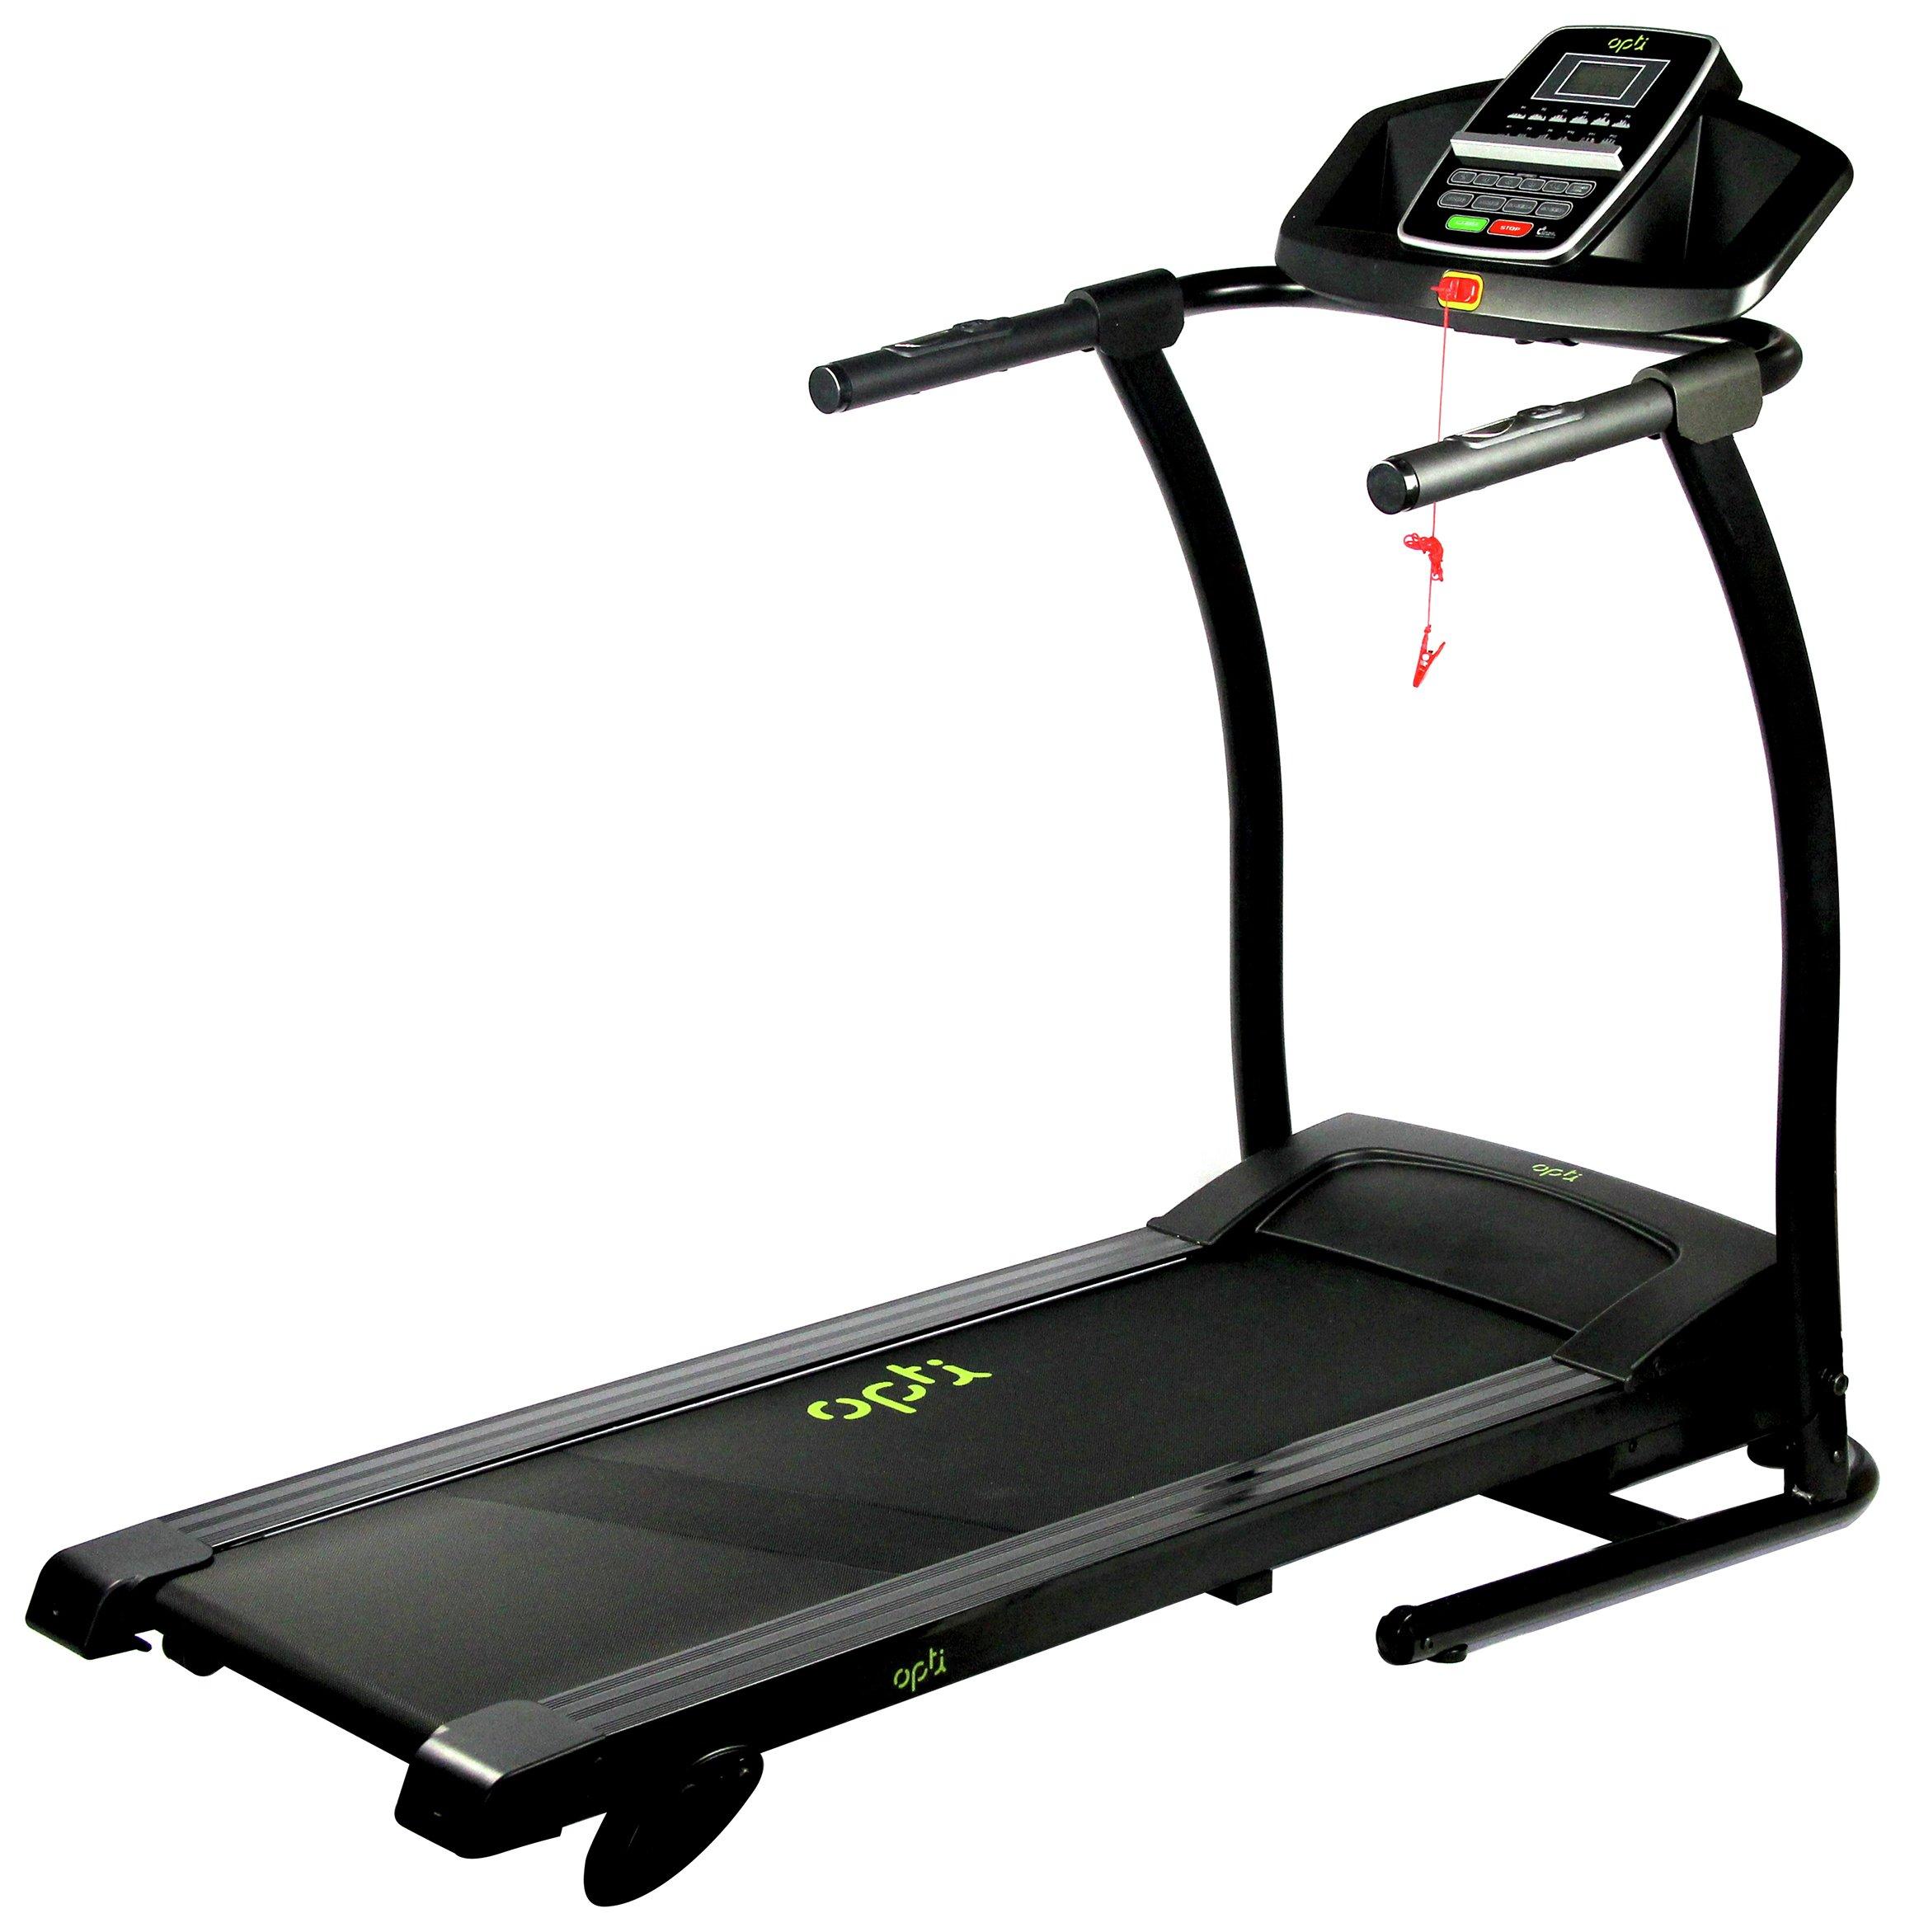 york fitness aspire treadmill. buy opti motorised folding treadmill at argos.co.uk - your online shop for treadmills, fitness equipment, sports and leisure. york aspire